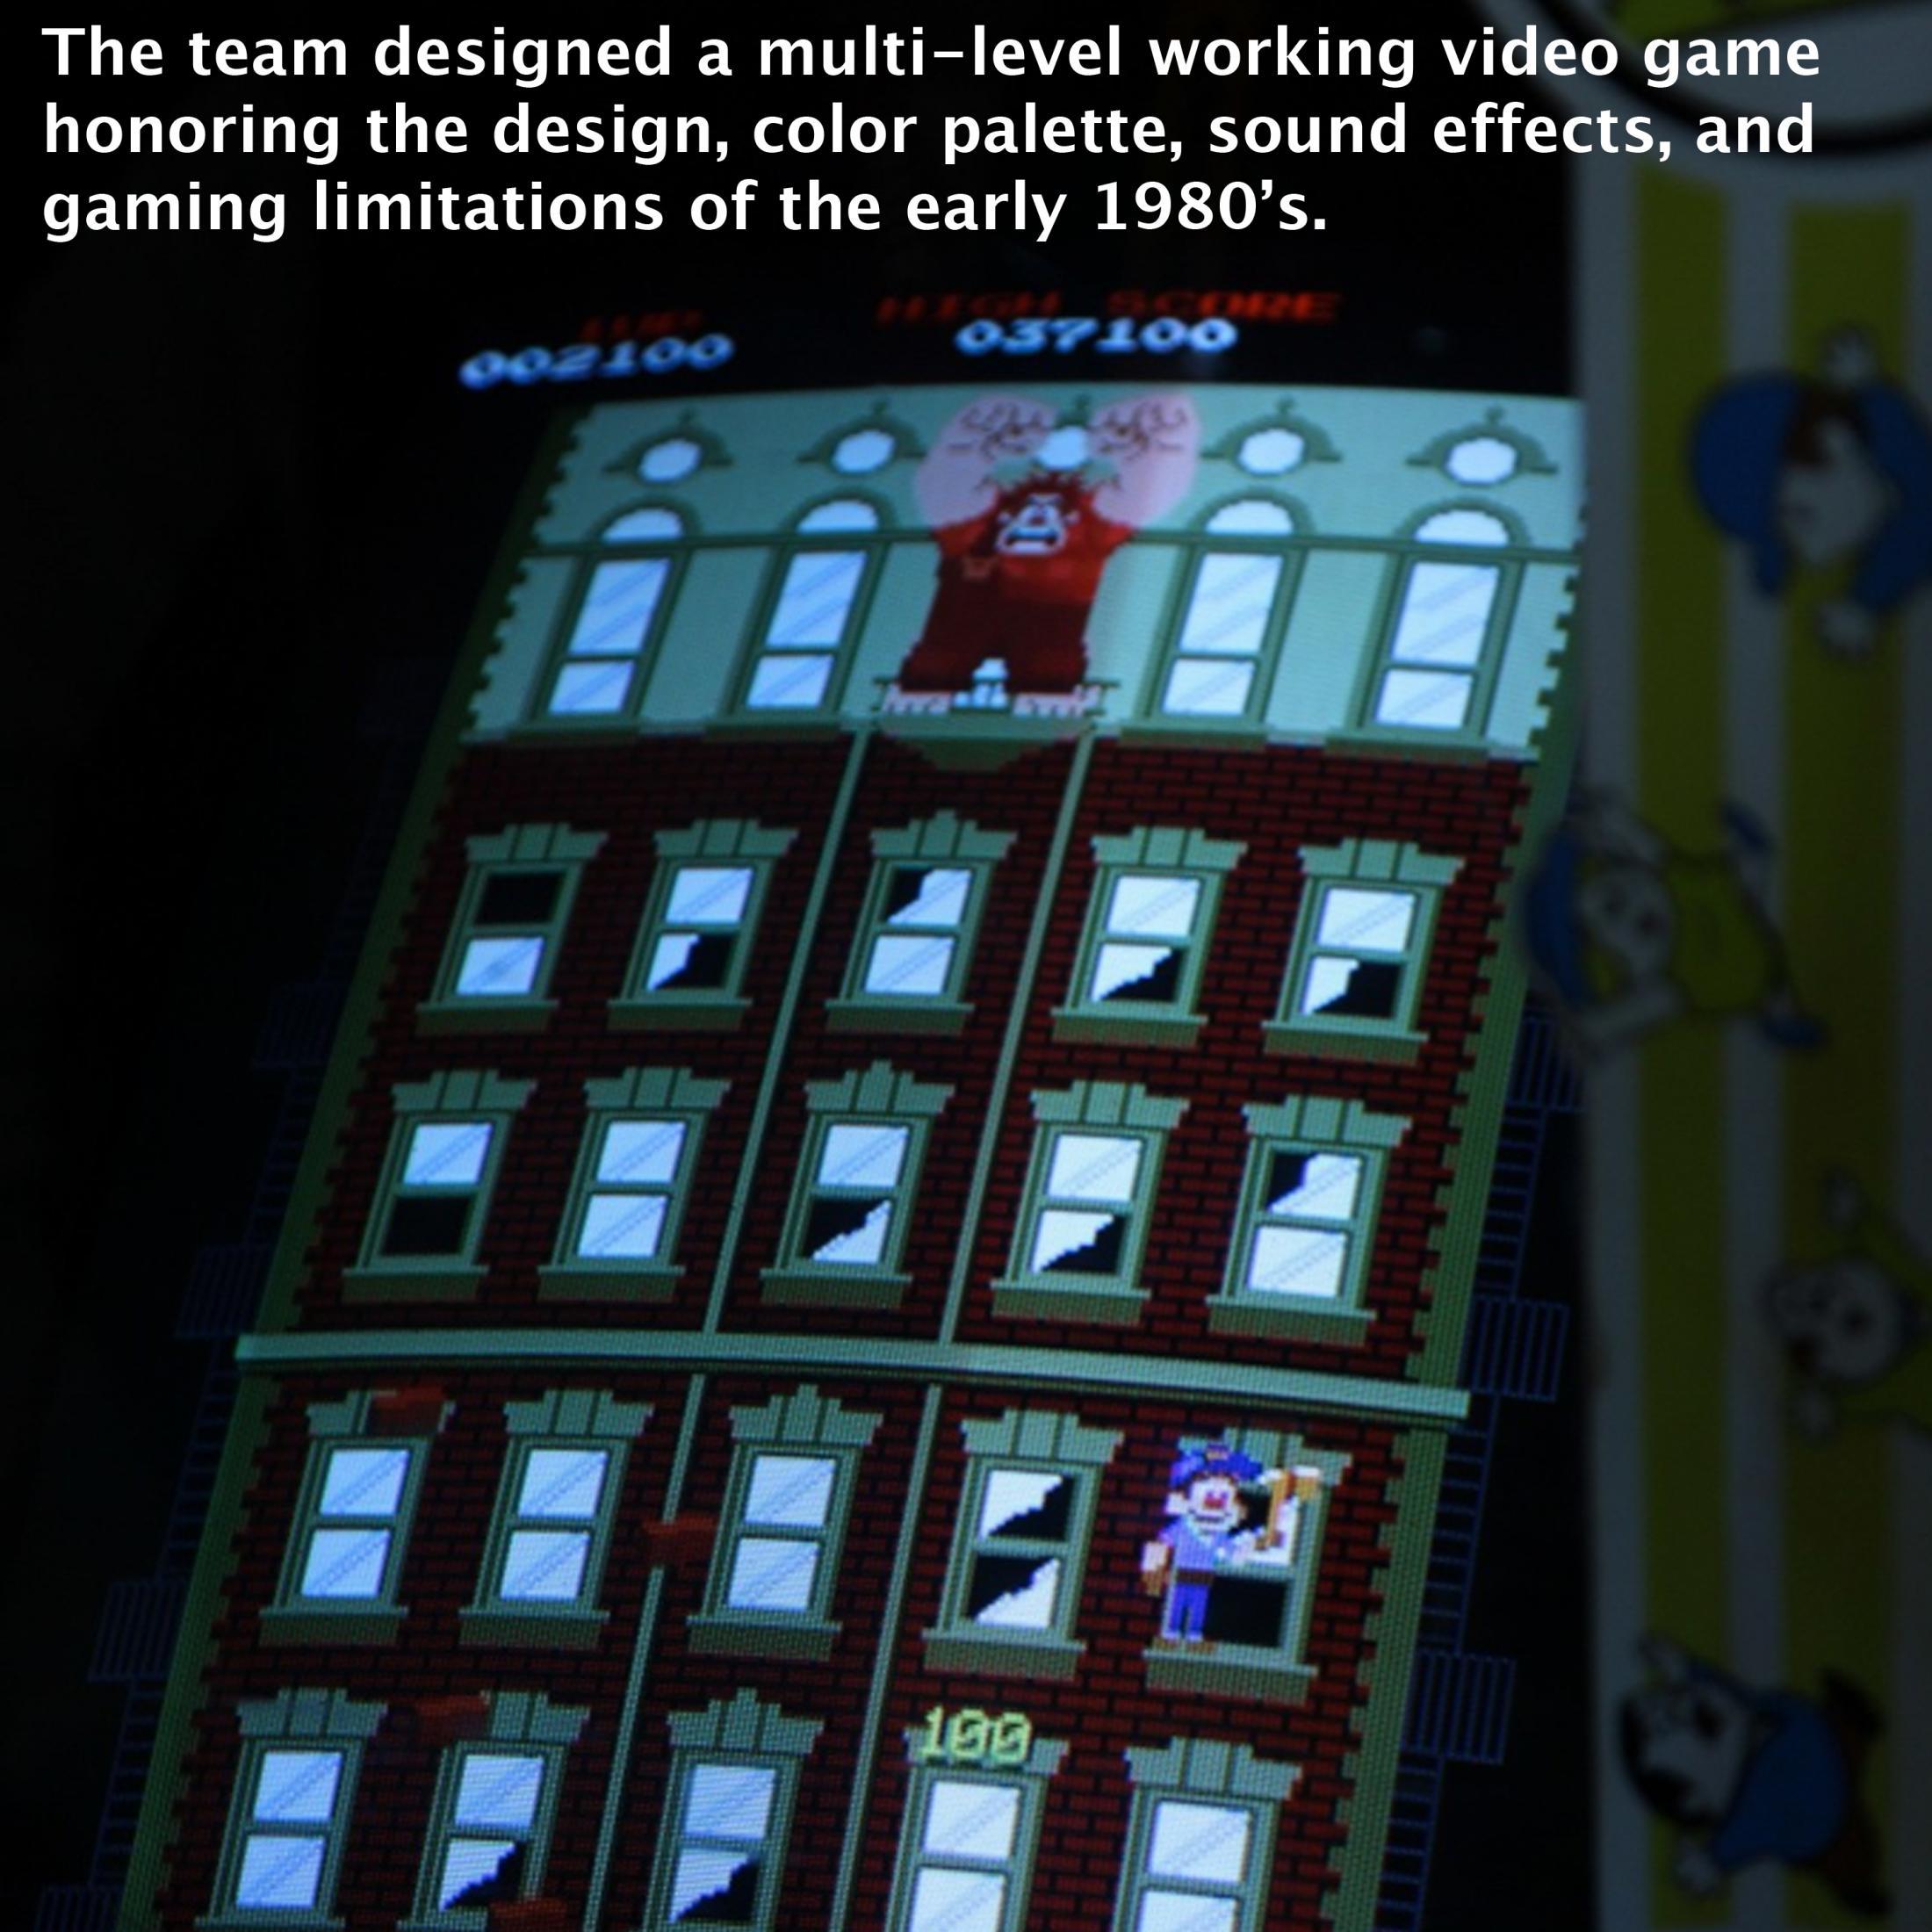 Thumbnail for Fix-It Felix Jr. Game Cabinet